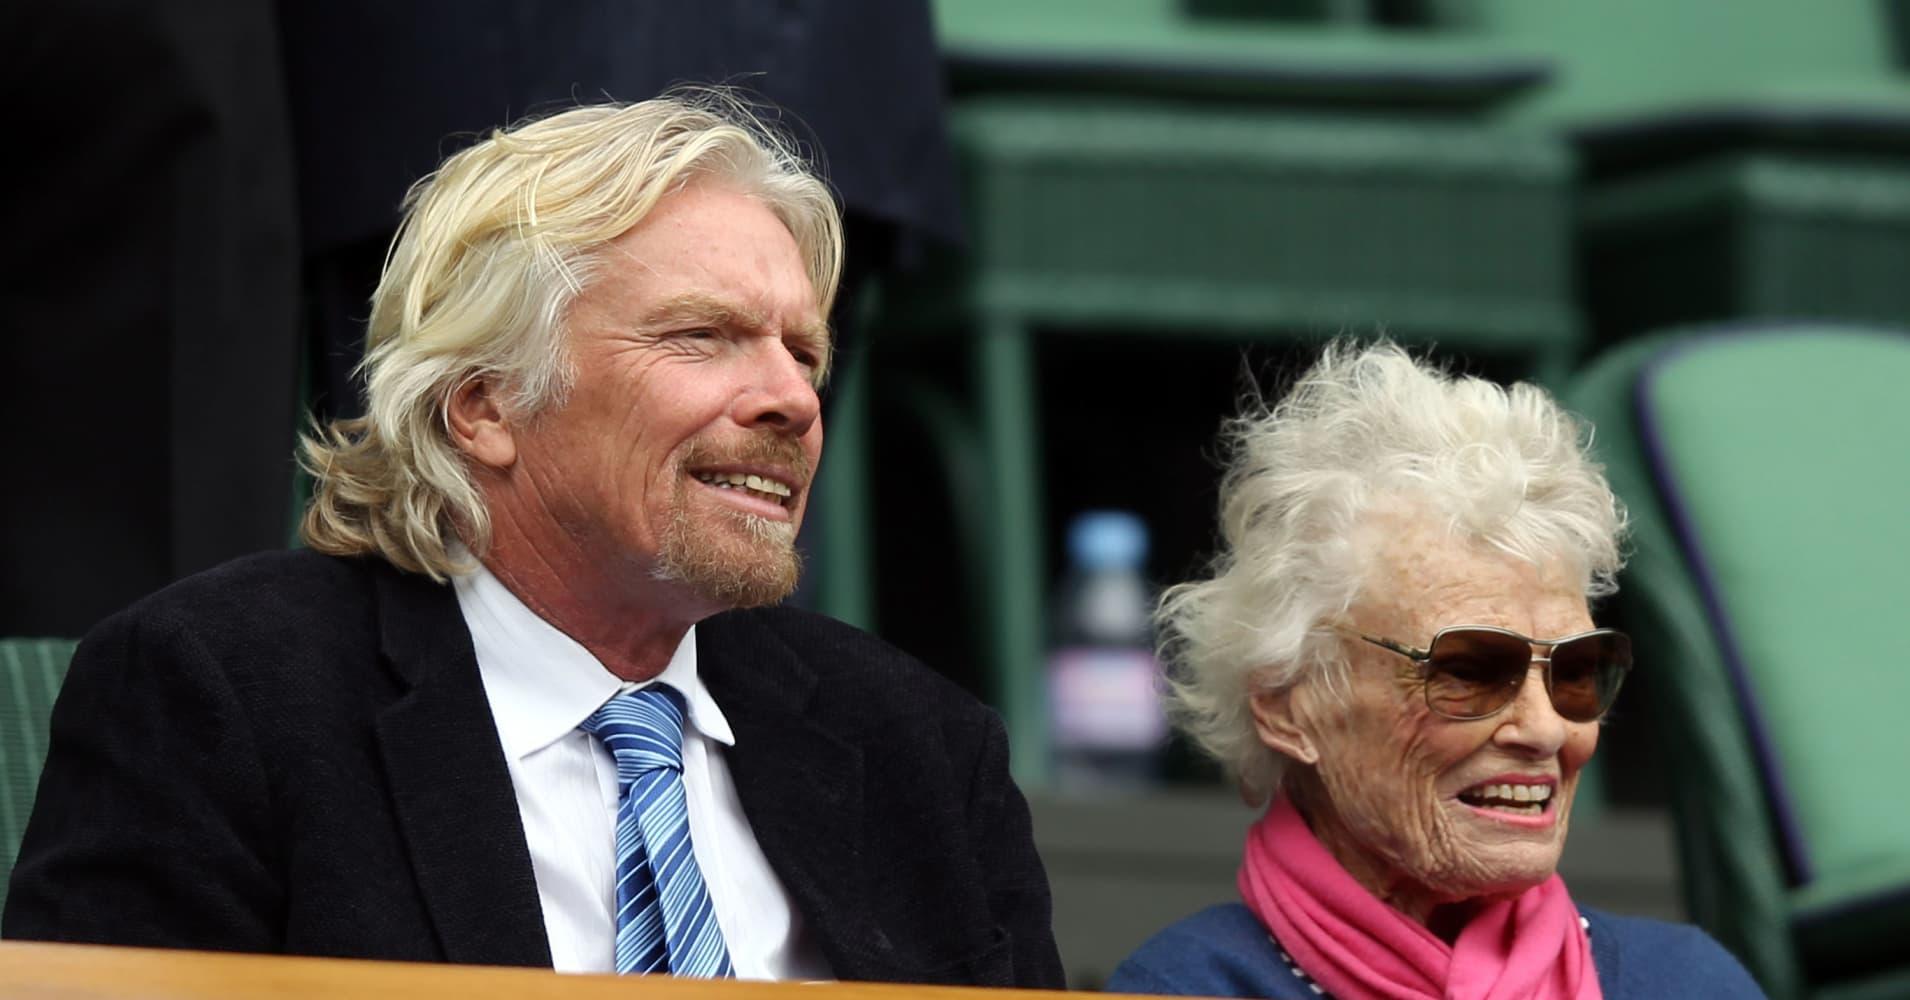 Richard Branson's mom shares the secret to raising successful businessmen